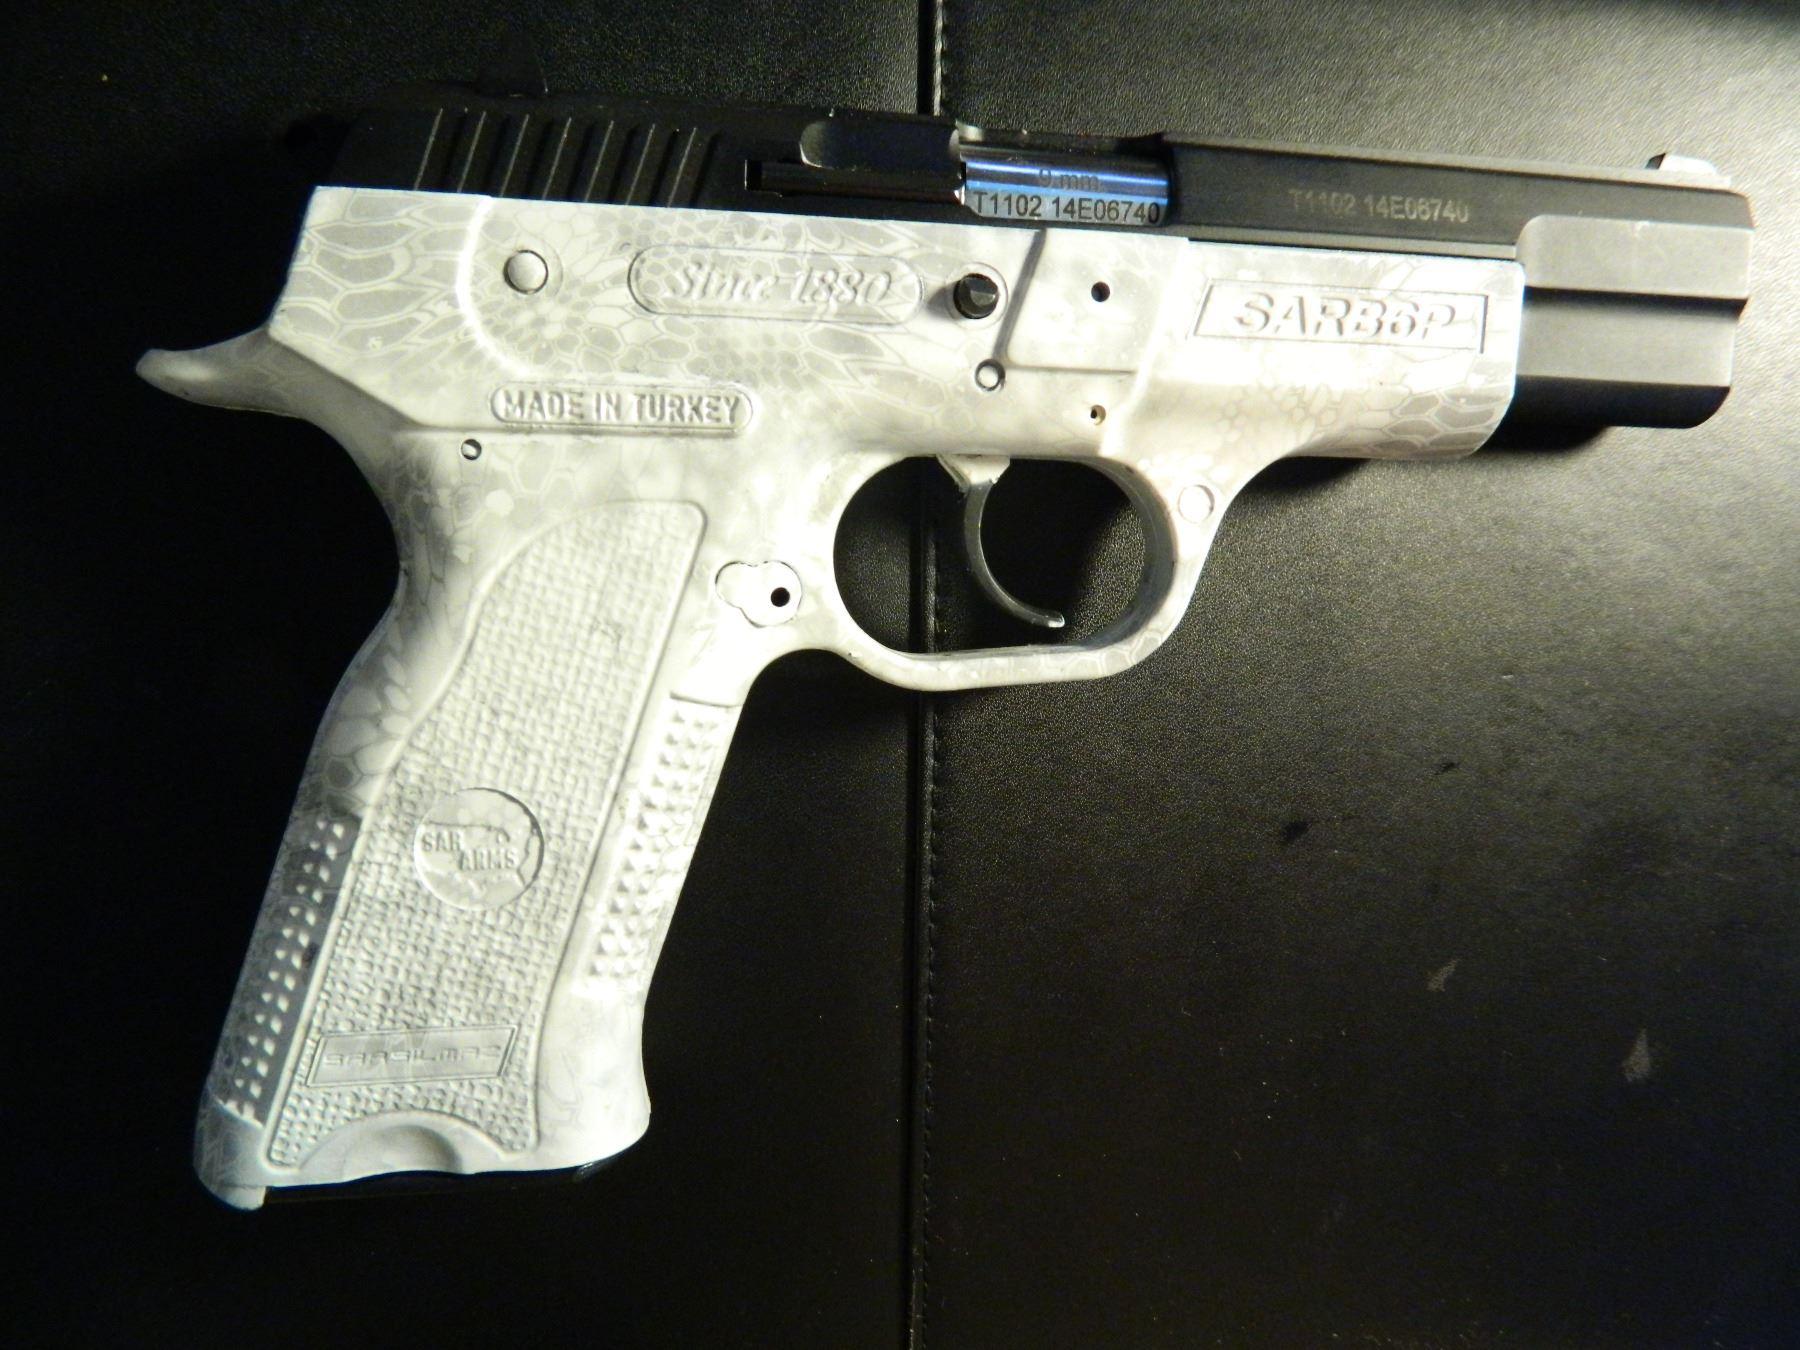 SAR ARMS B6P, 9mm, 16 Shot, Polymer Frame, Auctioneer Shot One Box